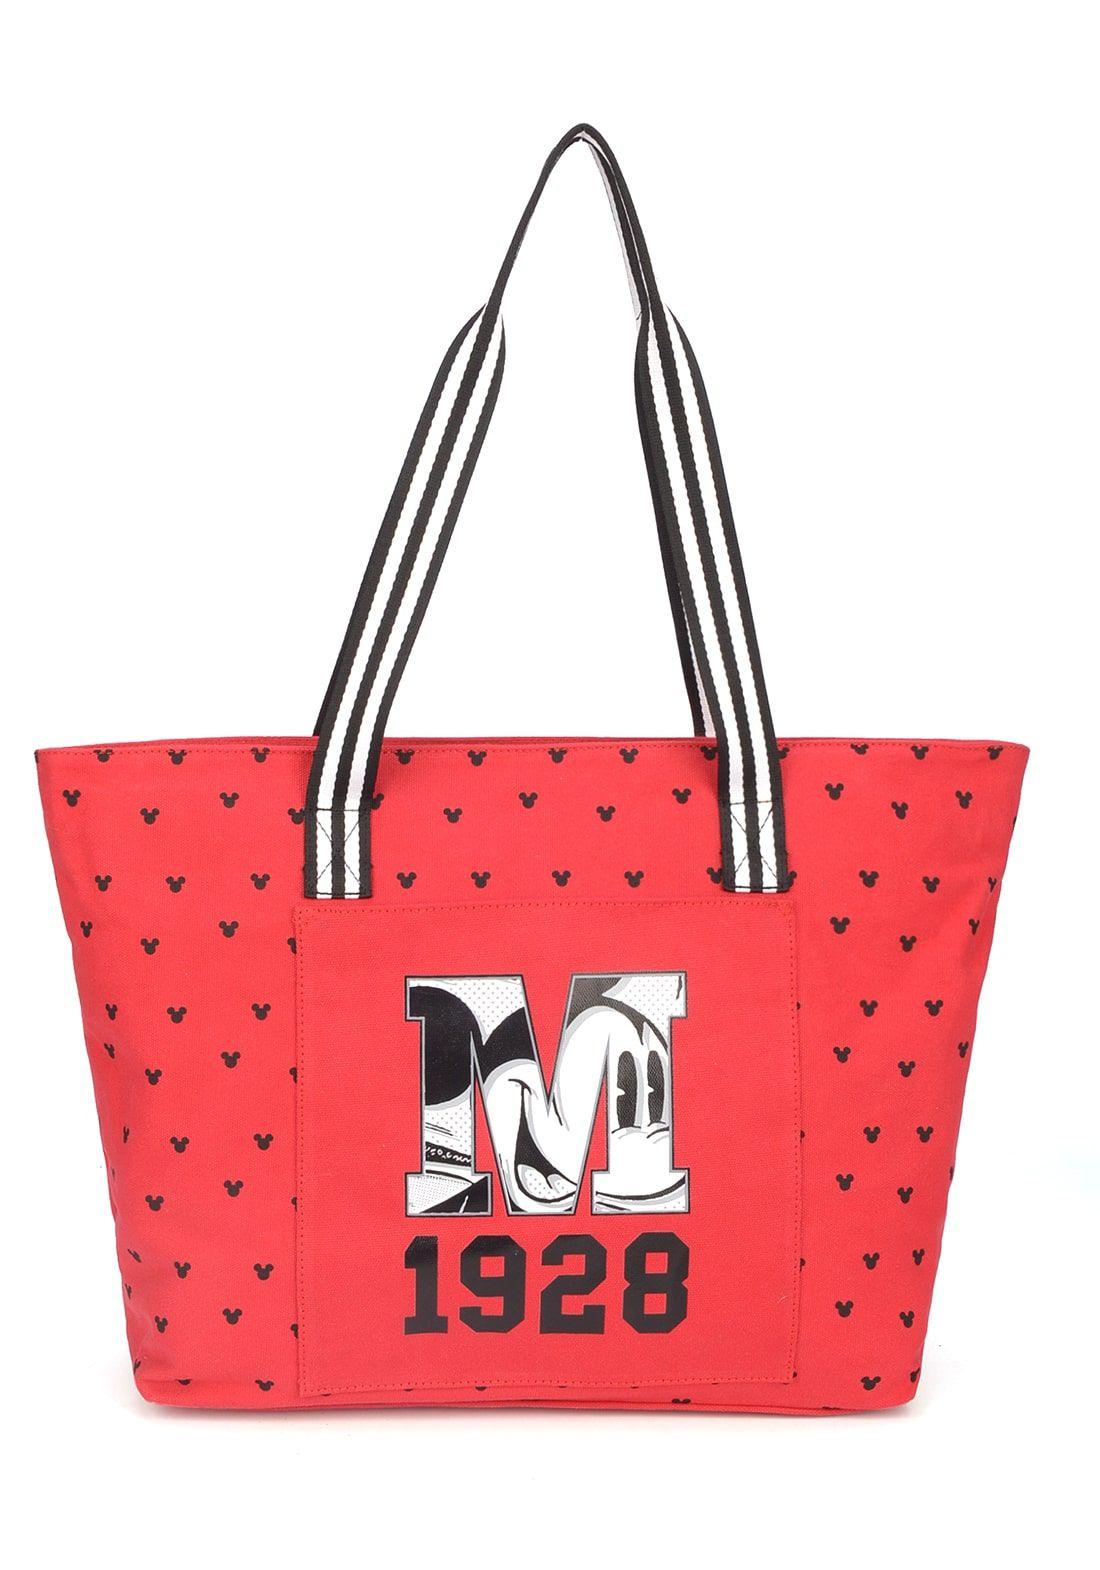 Bolsa Mickey Vermelha Bolsa Tote Disney 90 Anos Original